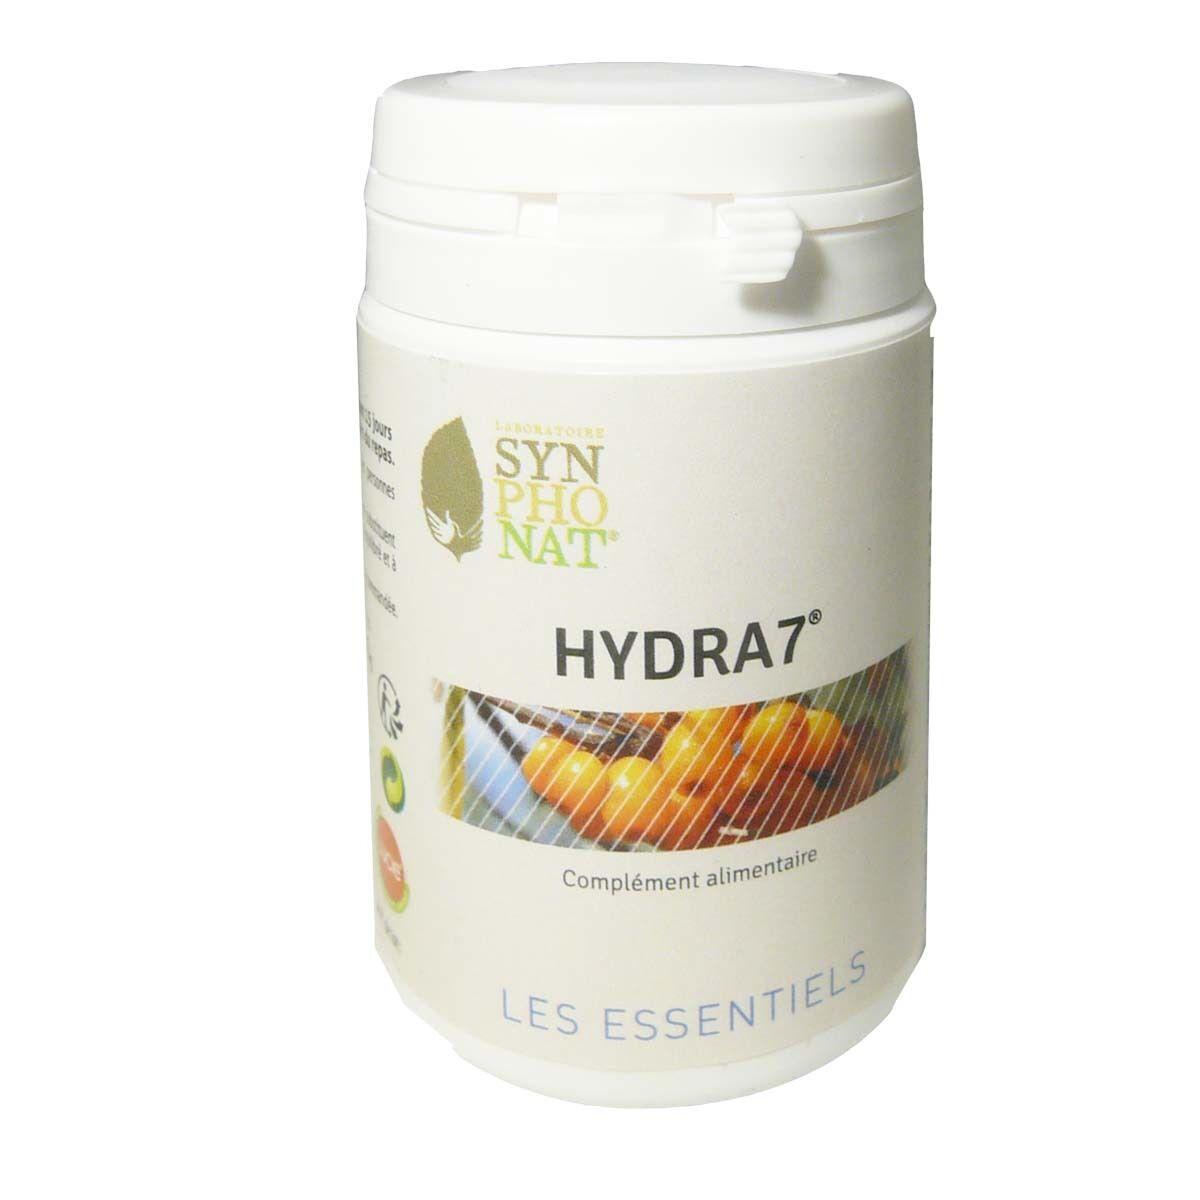 Synphonat hydra 7 60 capsules